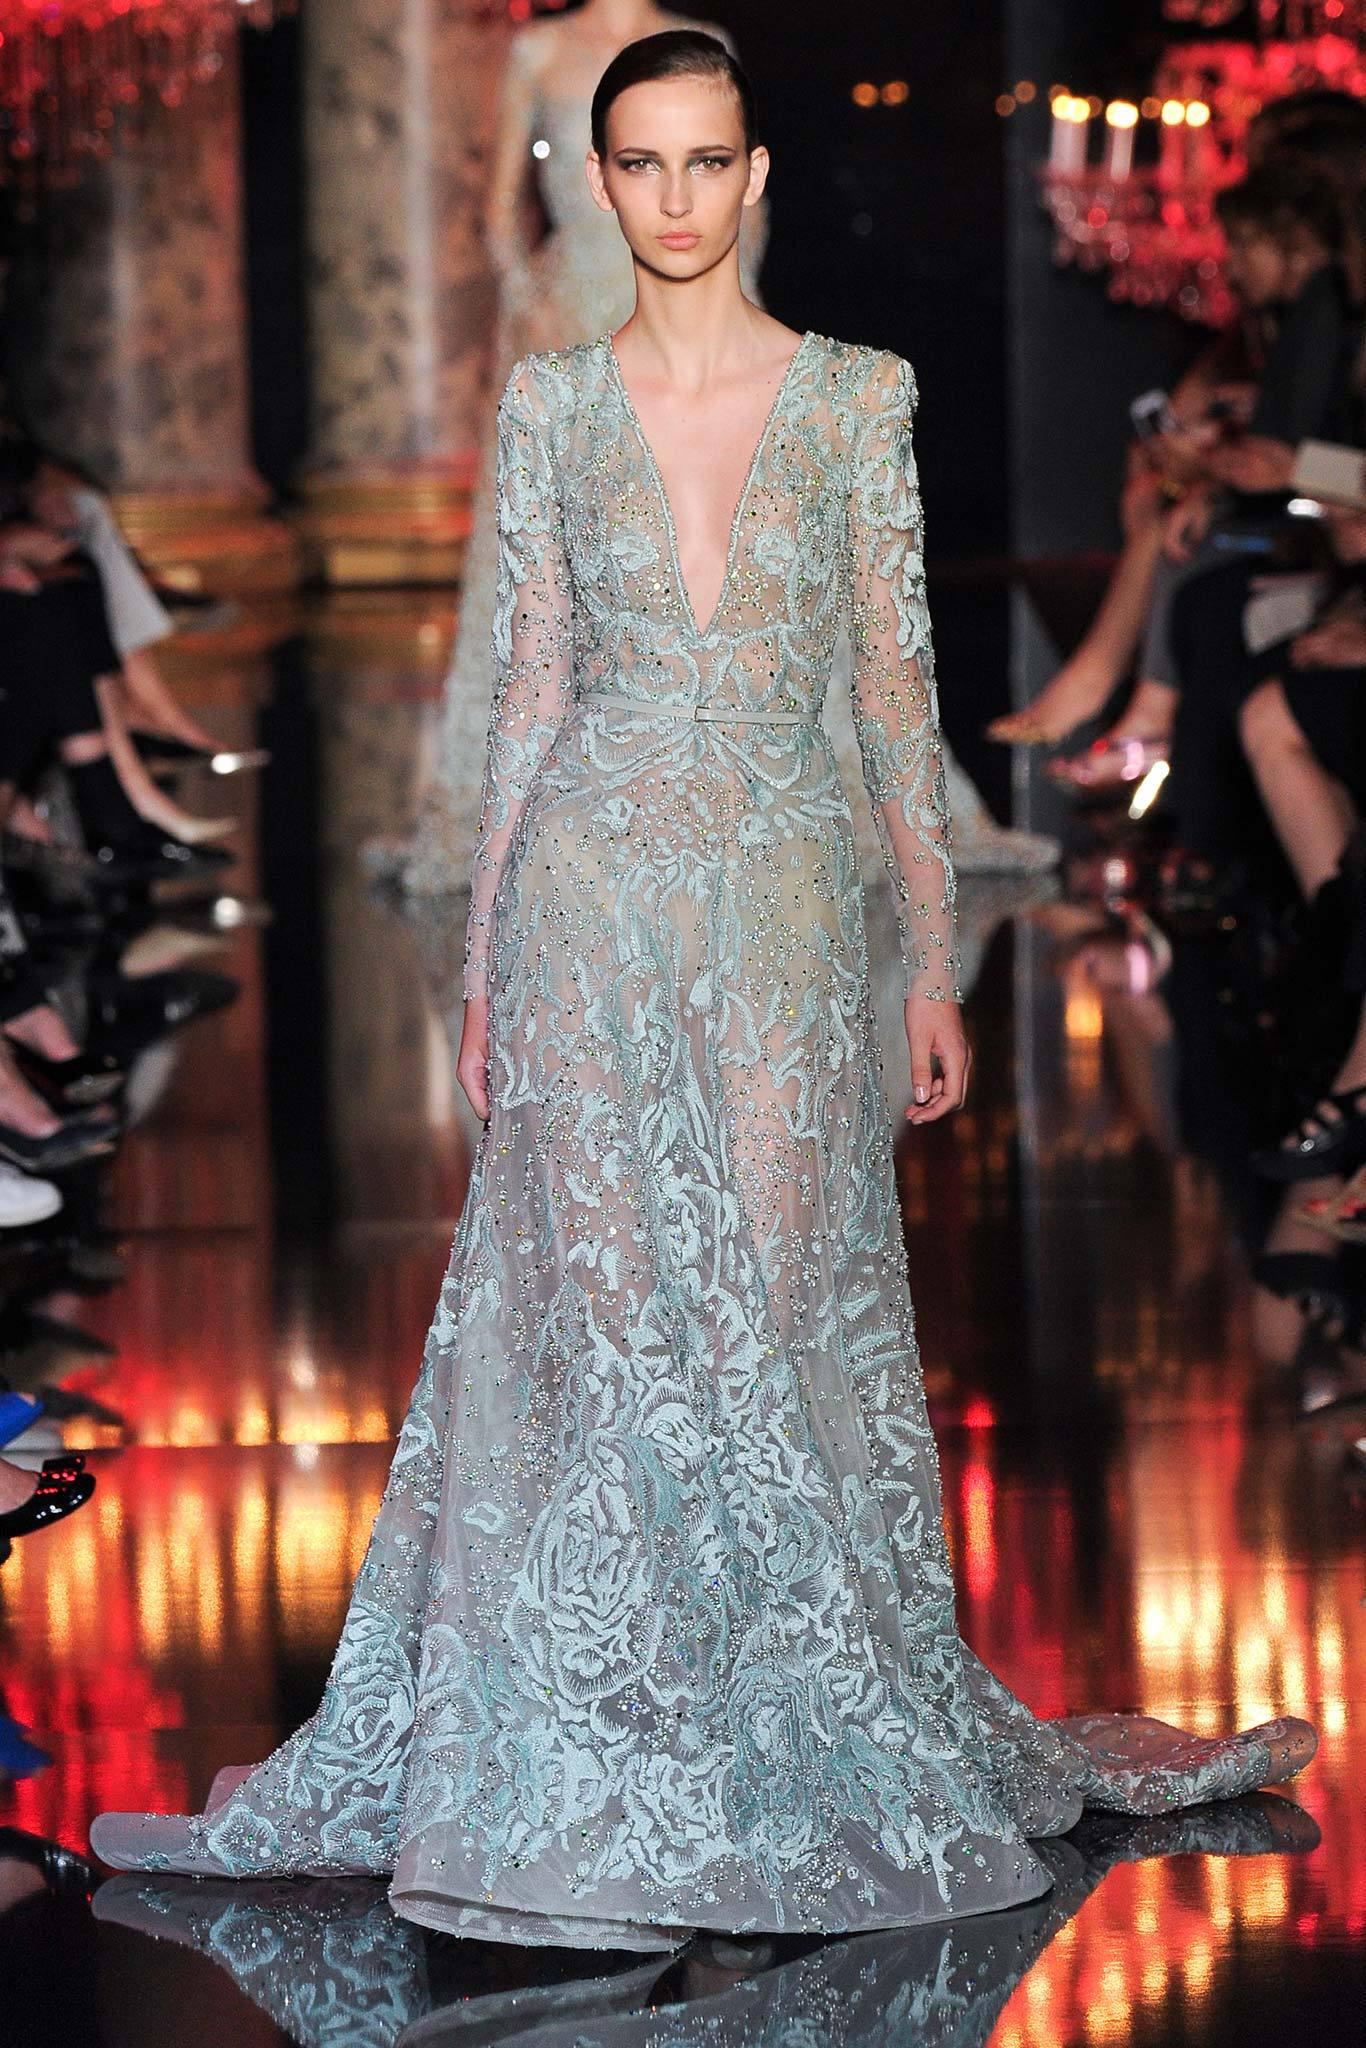 Elie-Saab-Couture-Fall2014-19.JPG